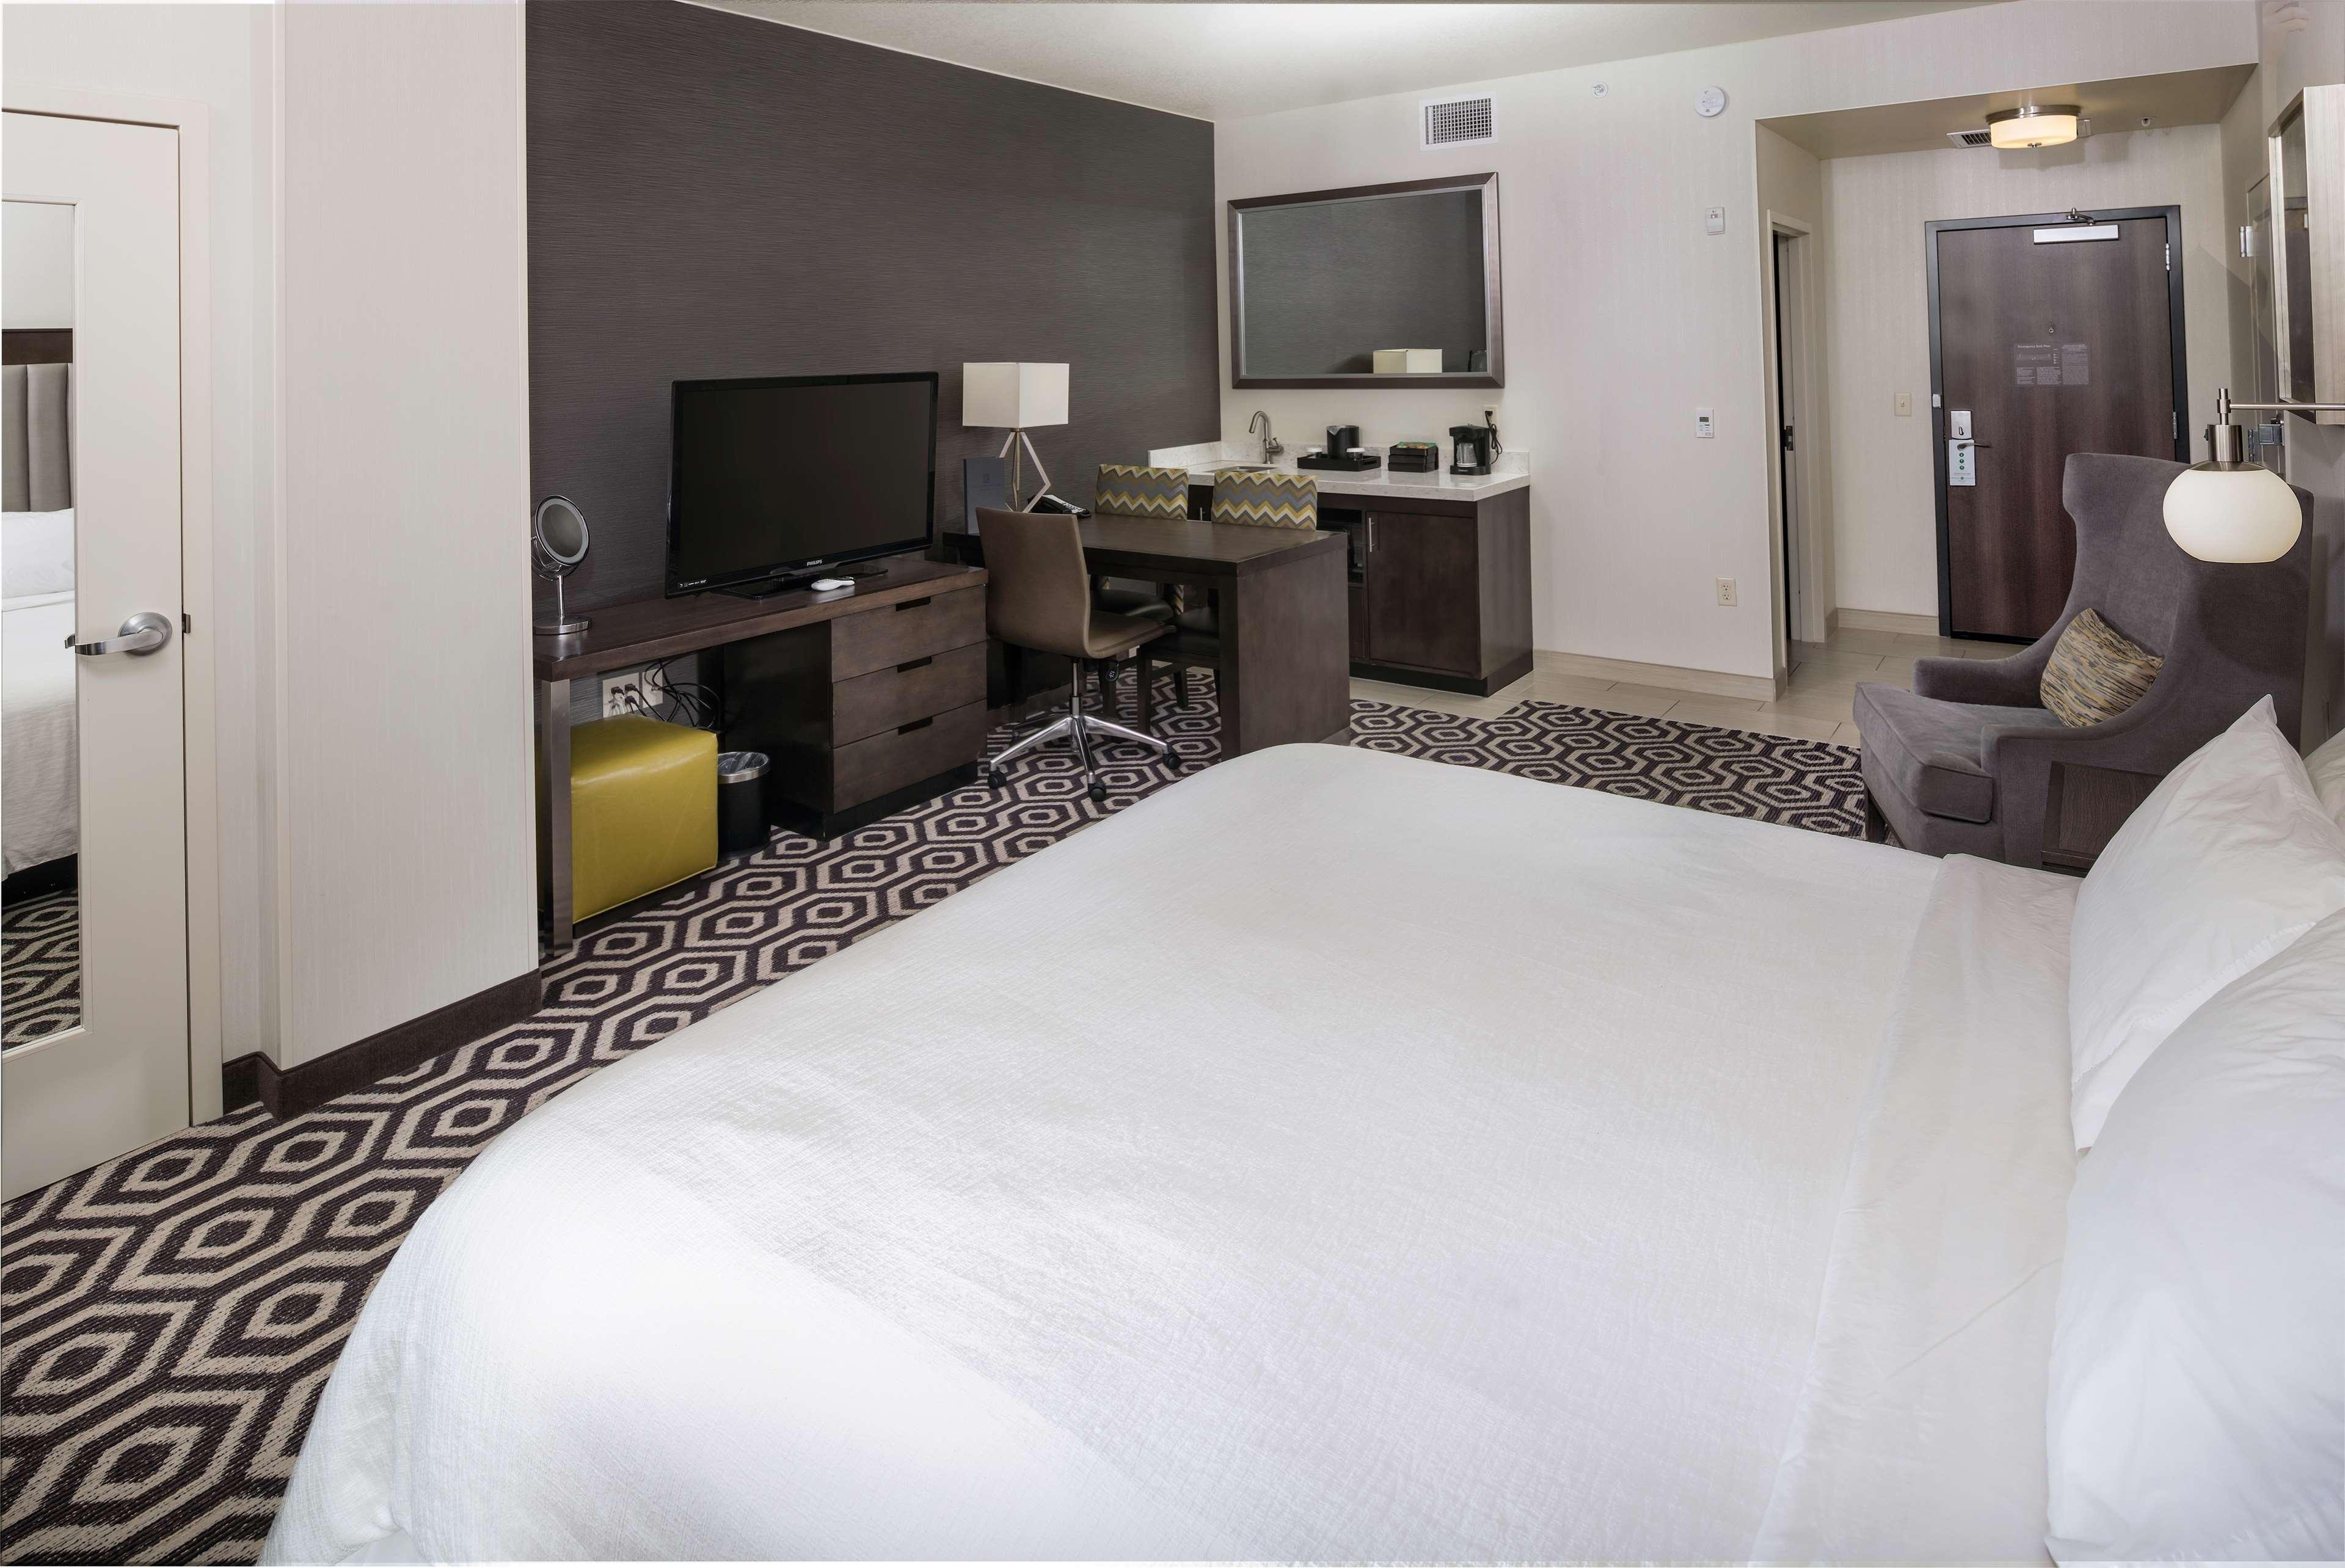 Embassy Suites by Hilton Portland Hillsboro, Oregon image 18